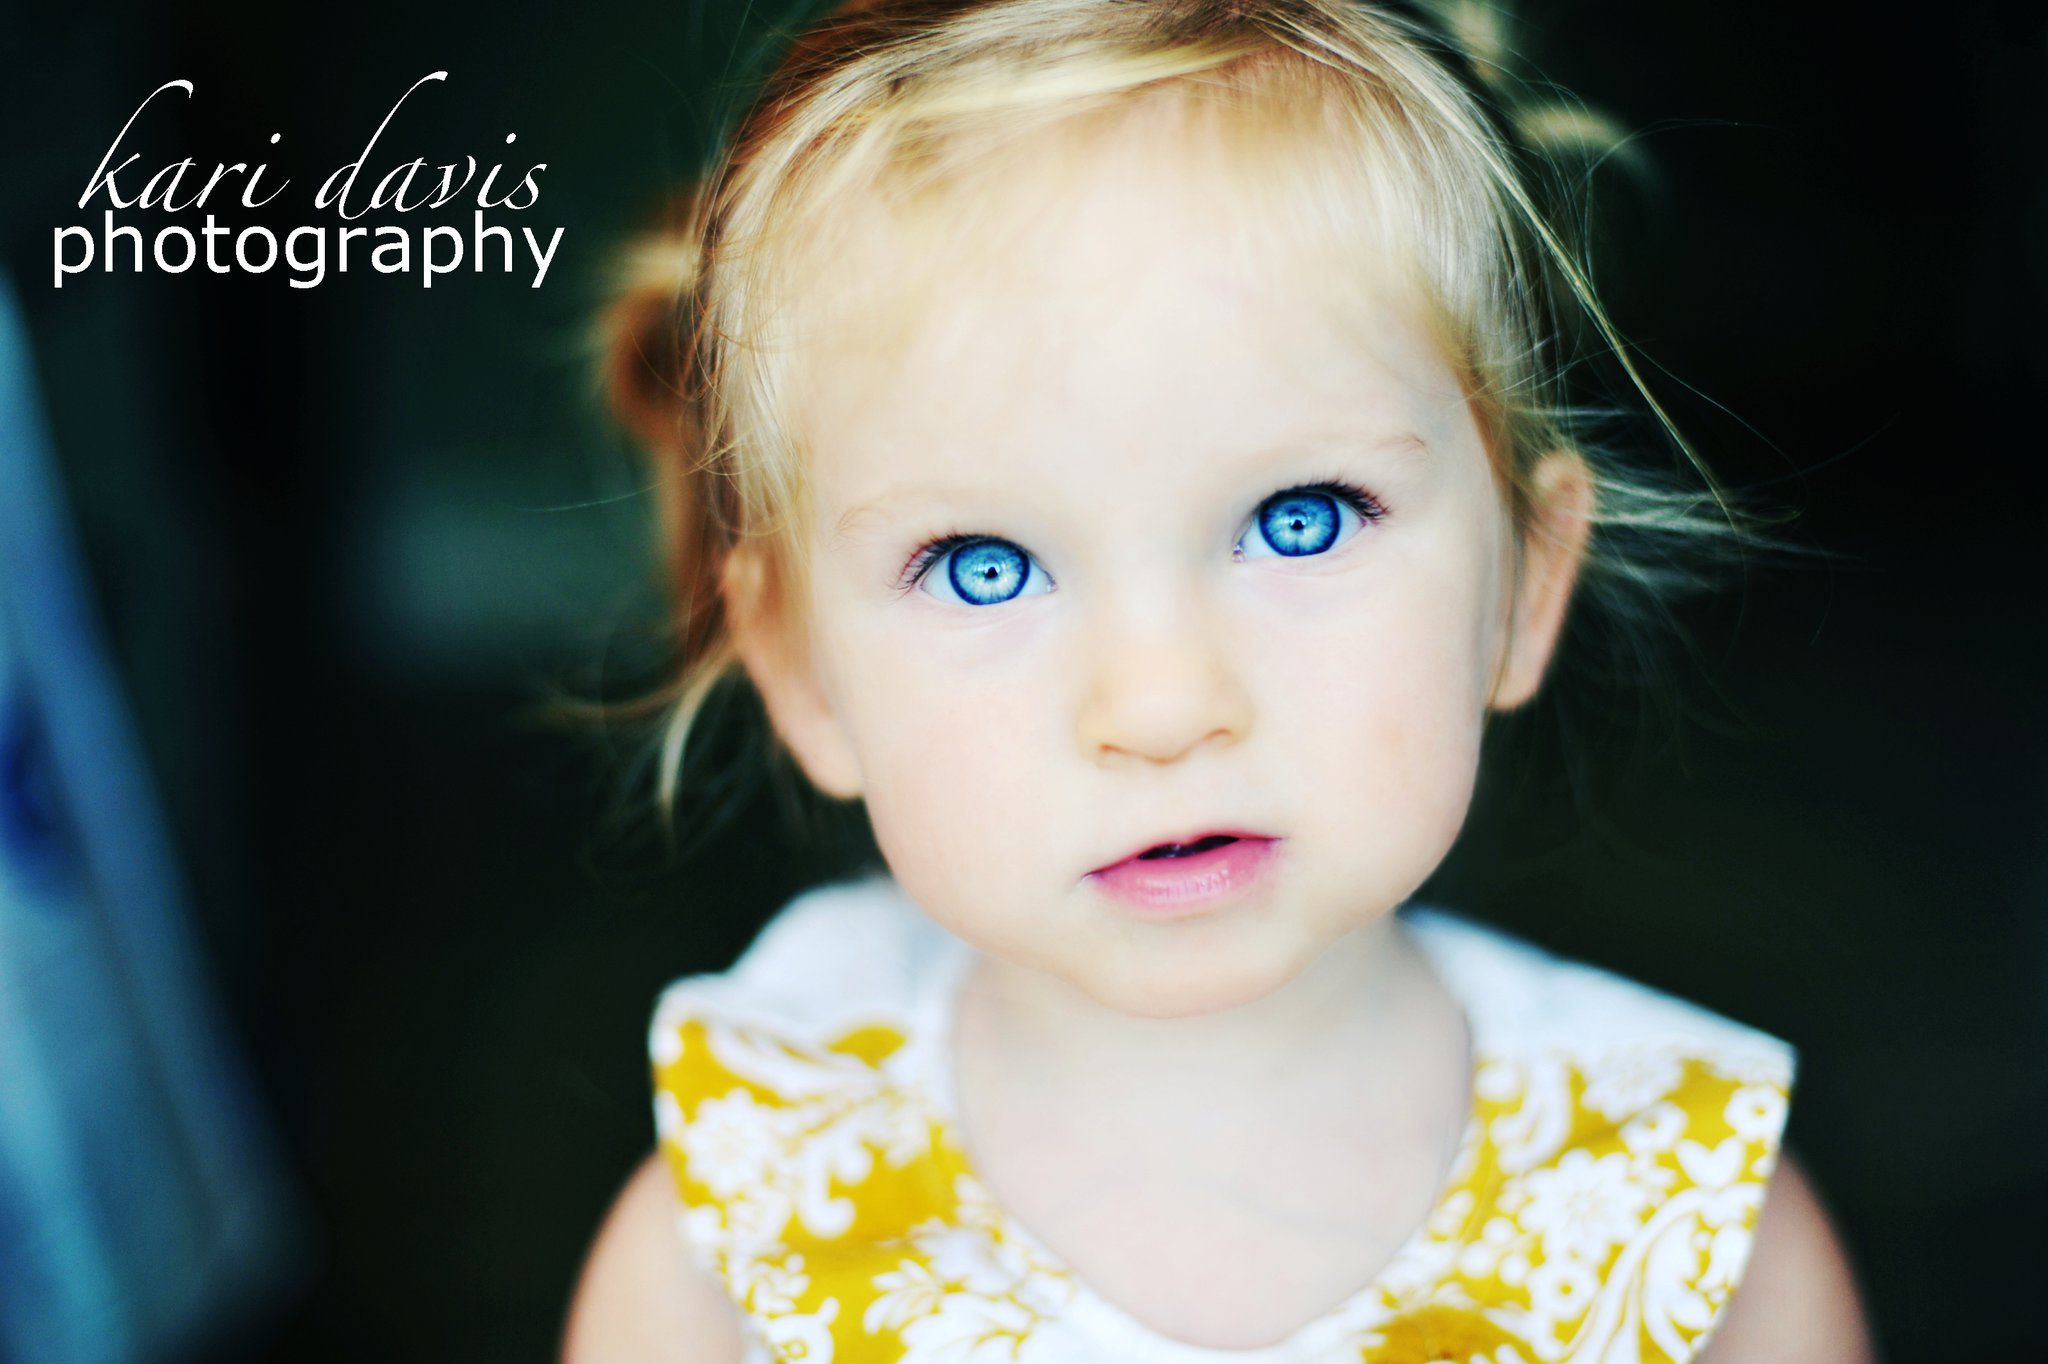 Those Eyes I Wish I Had Eyes Like That Oh And Her Hair I